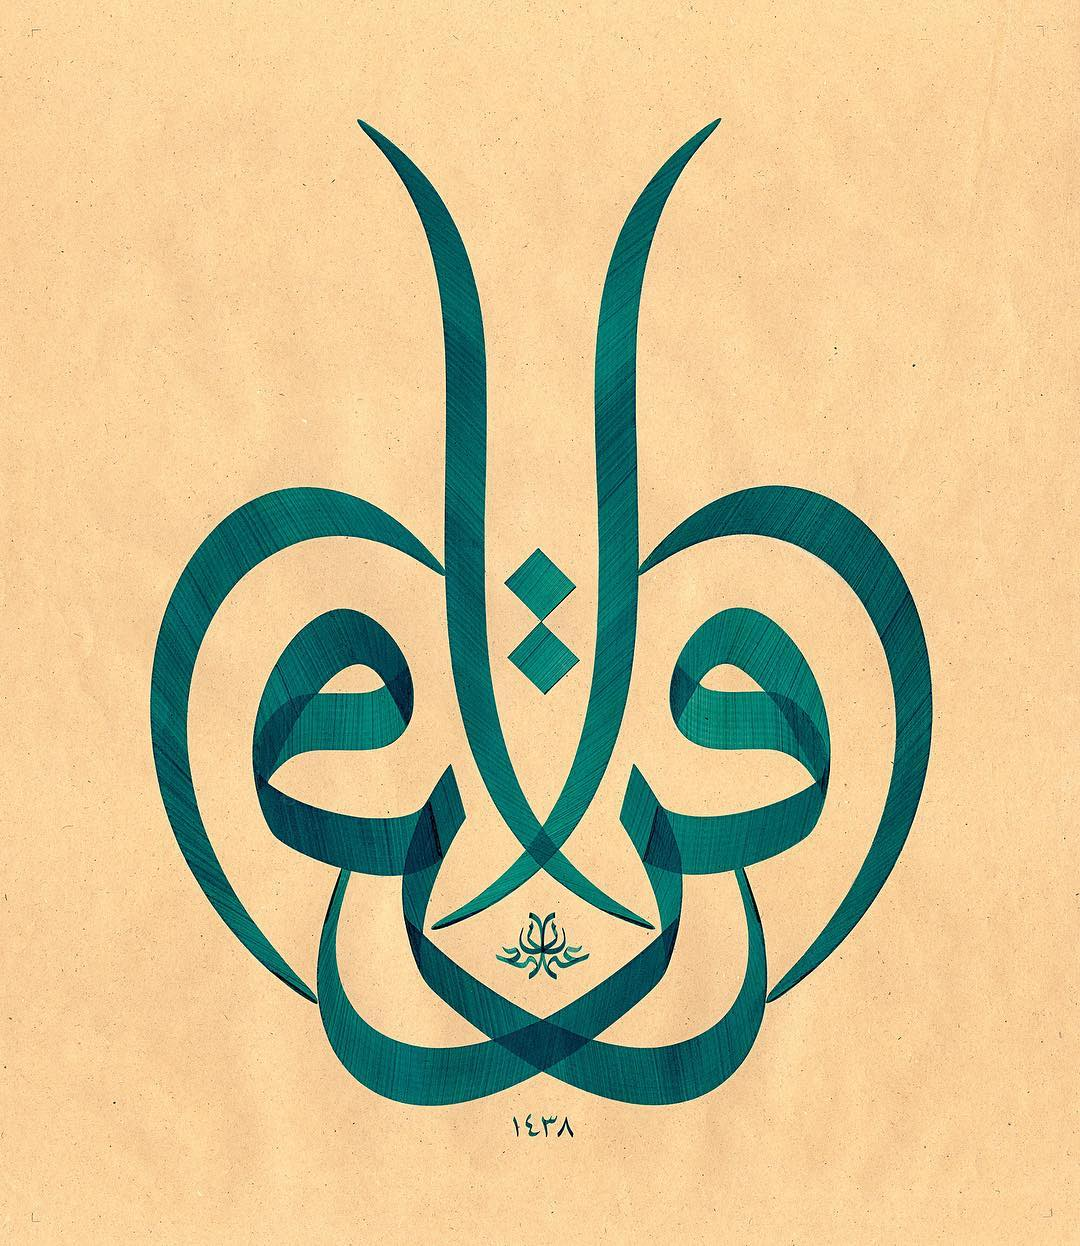 Donwload Photo Kaligrafi İkra' (oku) #hat #hattat #hatsanatı #art #ayet #arabic #calligraphy #calligraphe…- Osman Ozcay